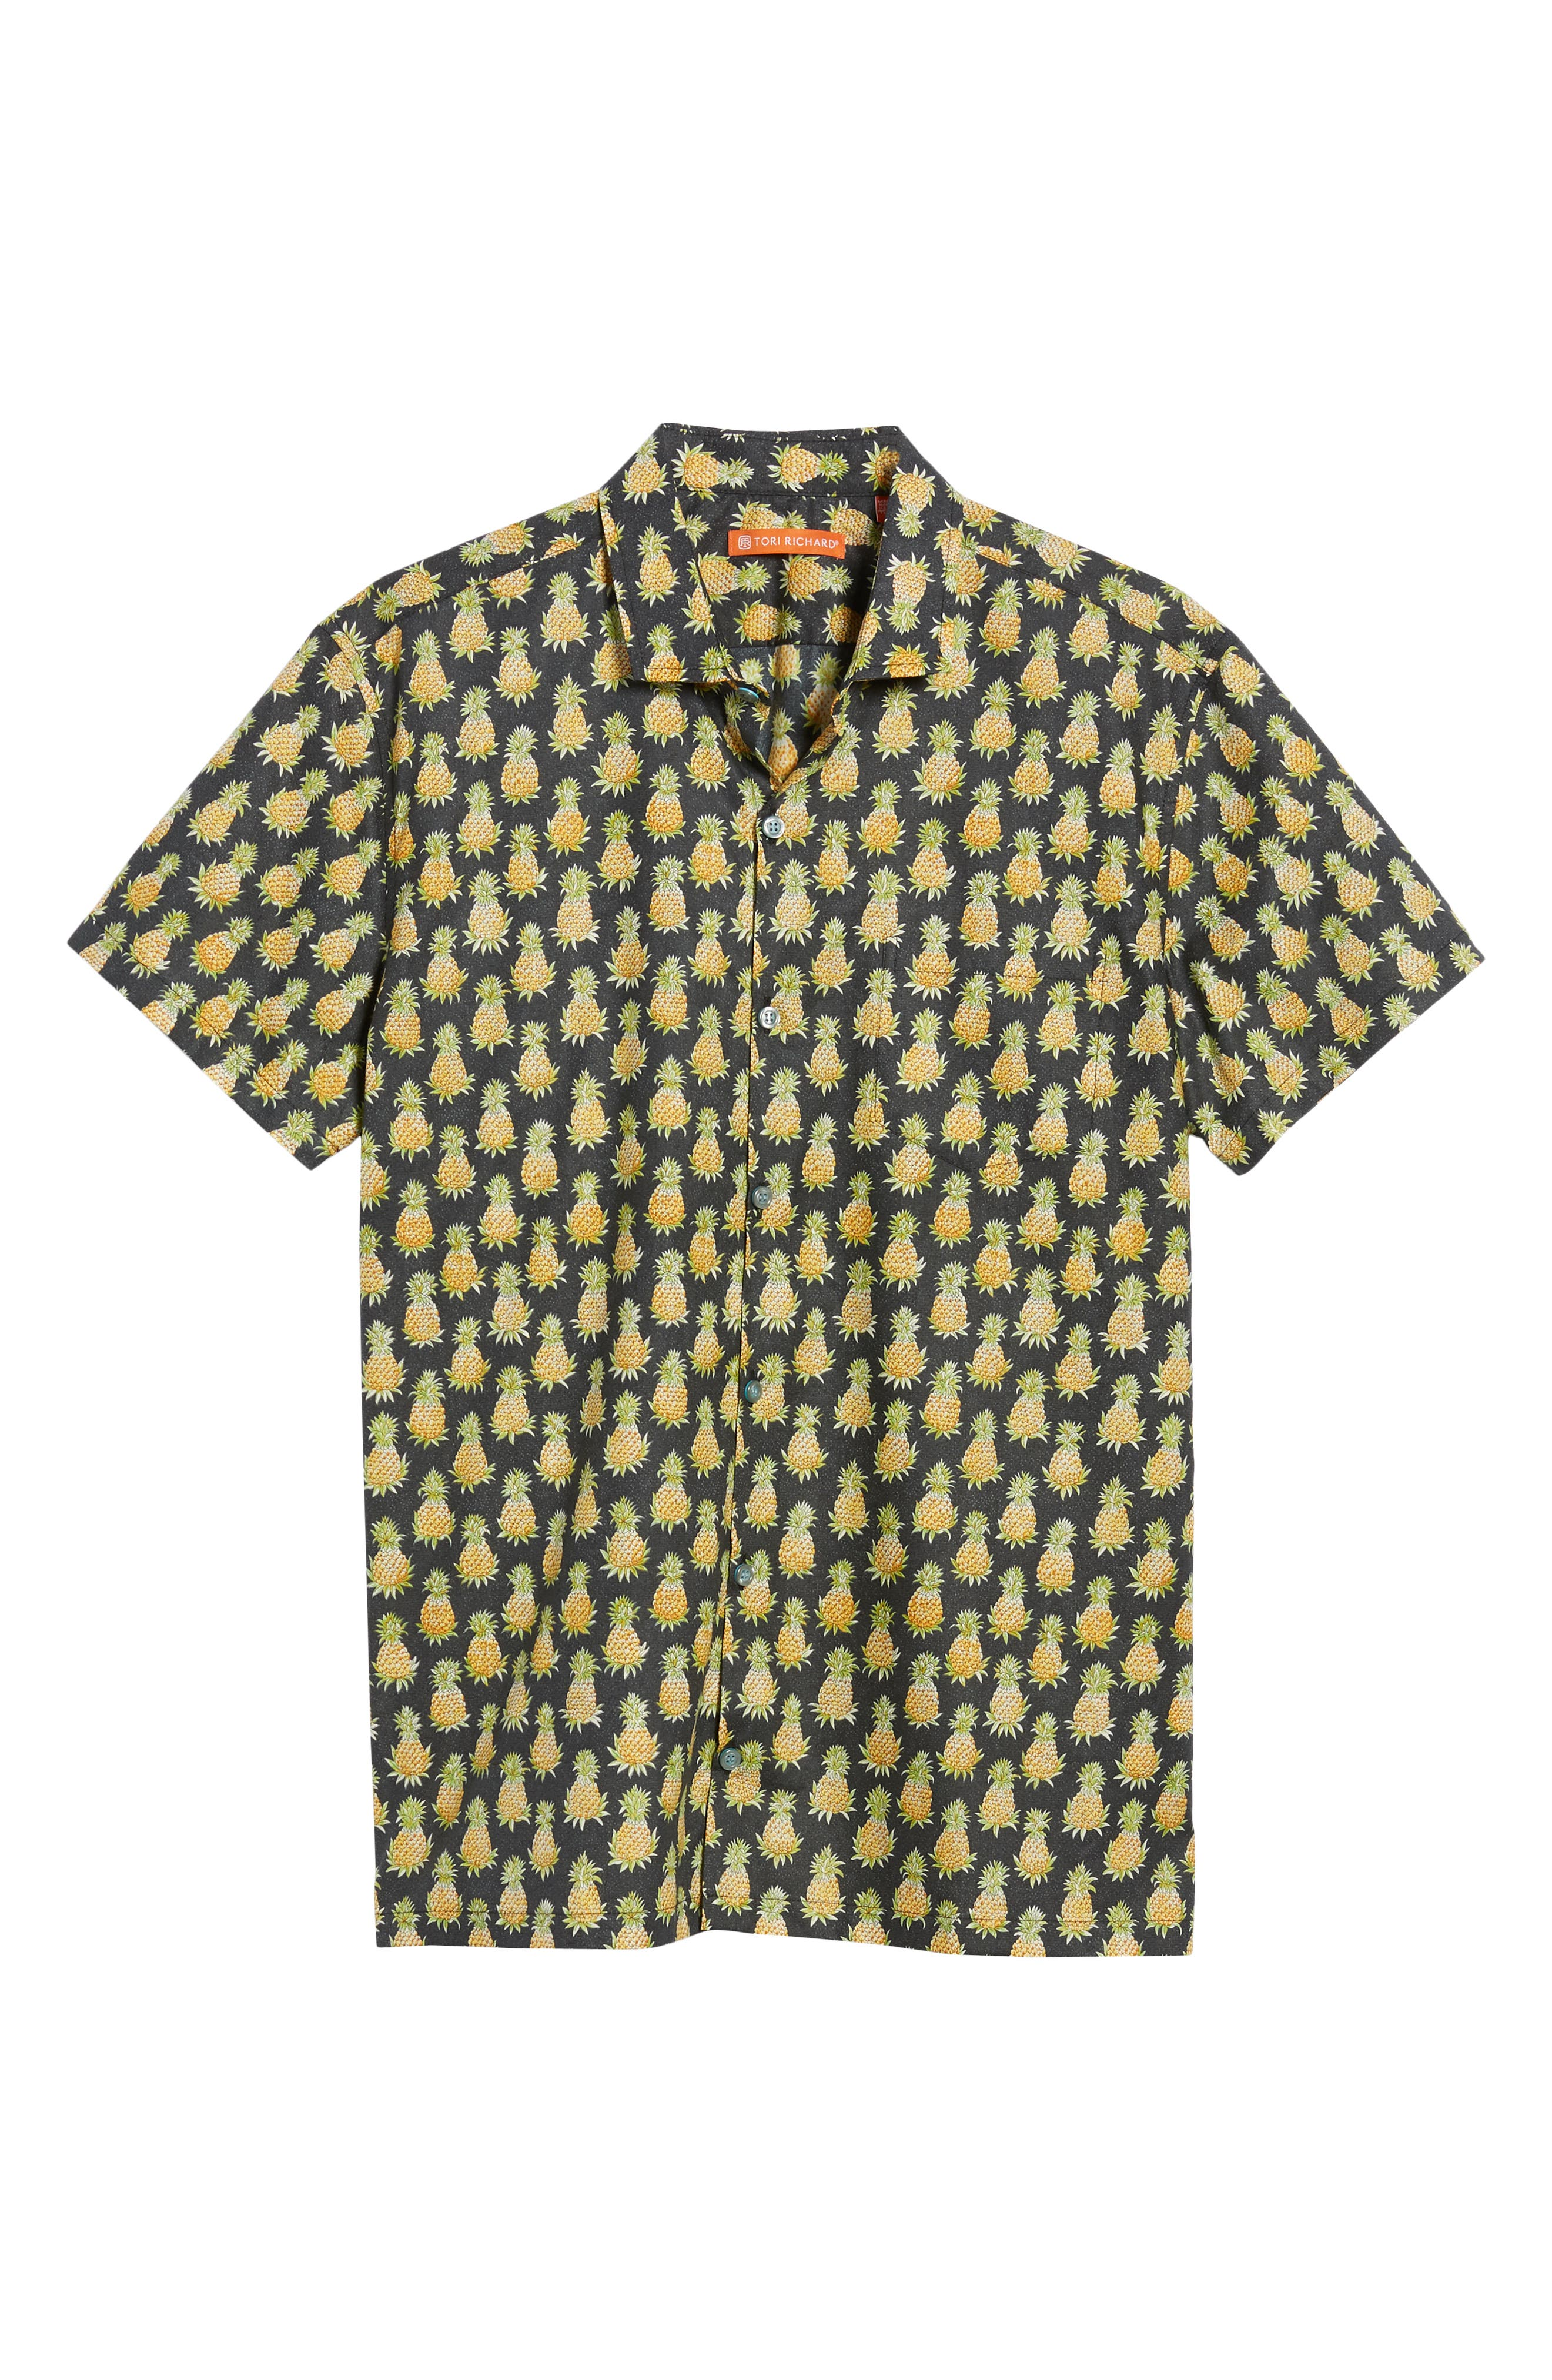 Pineaplism Trim Fit Camp Shirt,                             Alternate thumbnail 6, color,                             BLACK